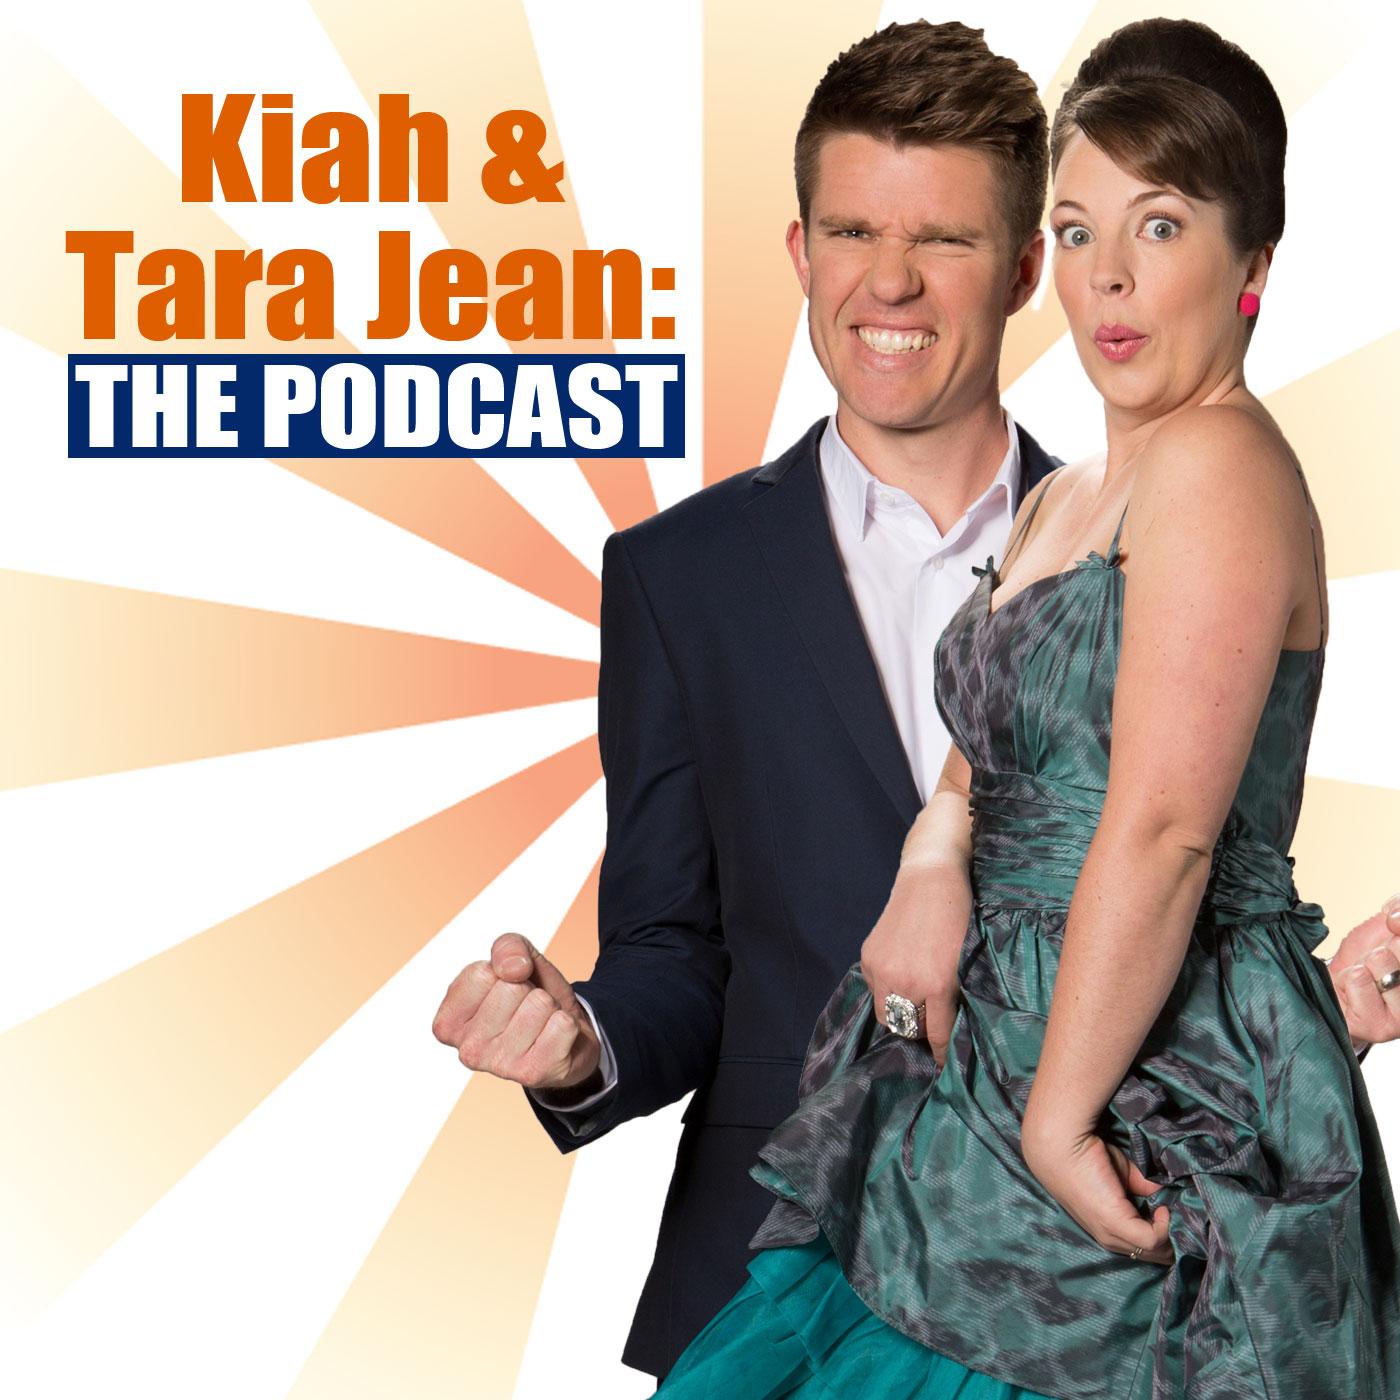 Kiah & Tara Jean: The Podcast